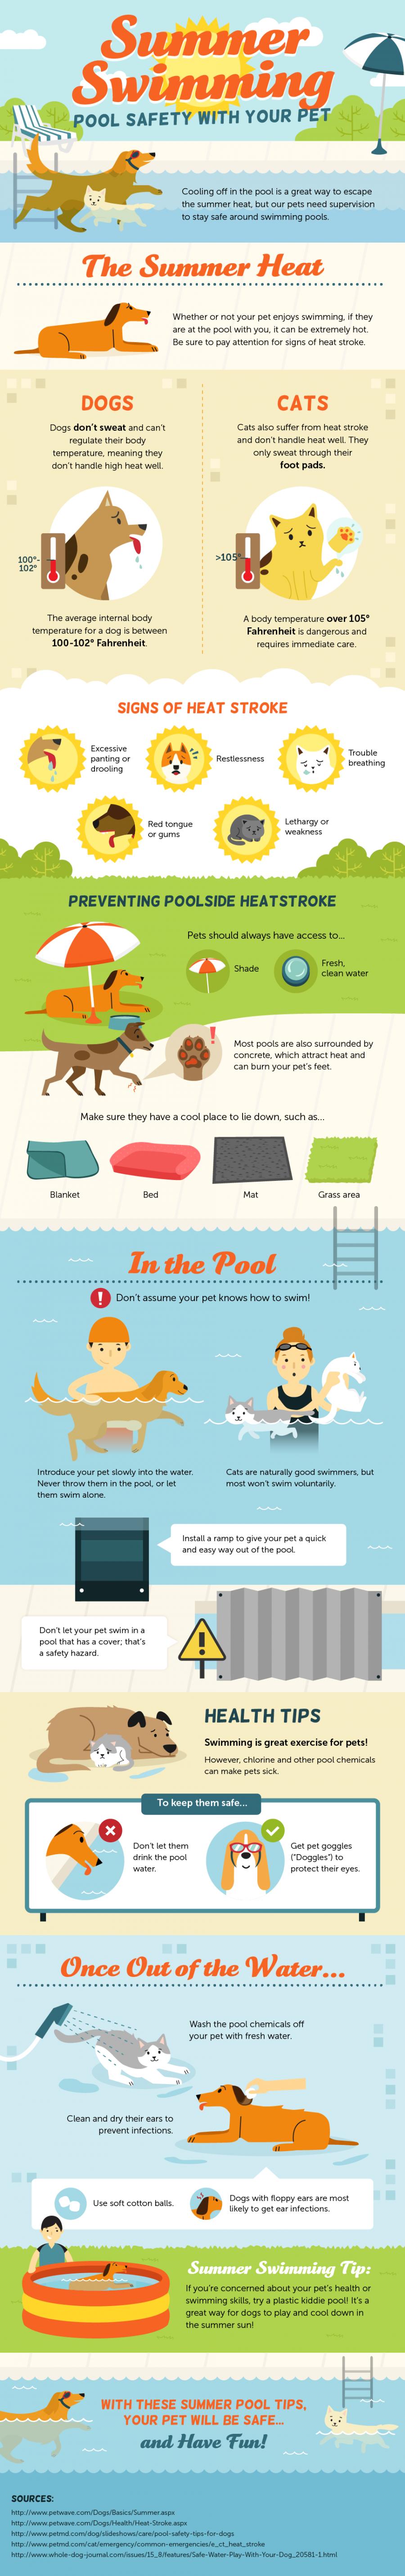 Pet Pool Safety